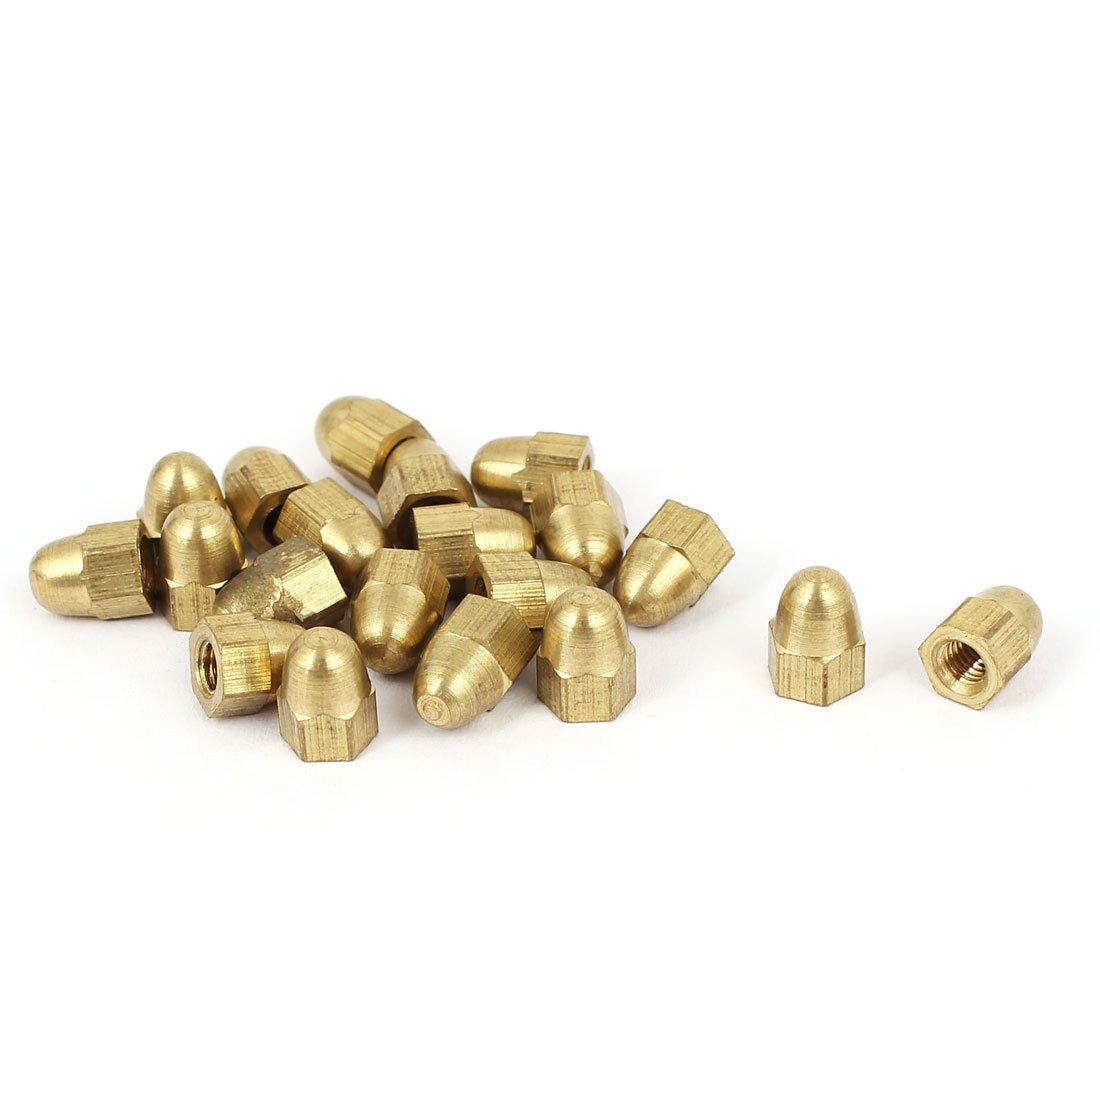 M3 Thread Dia Dome Head Brass Cap Acorn Hexagon Nuts 20pcs